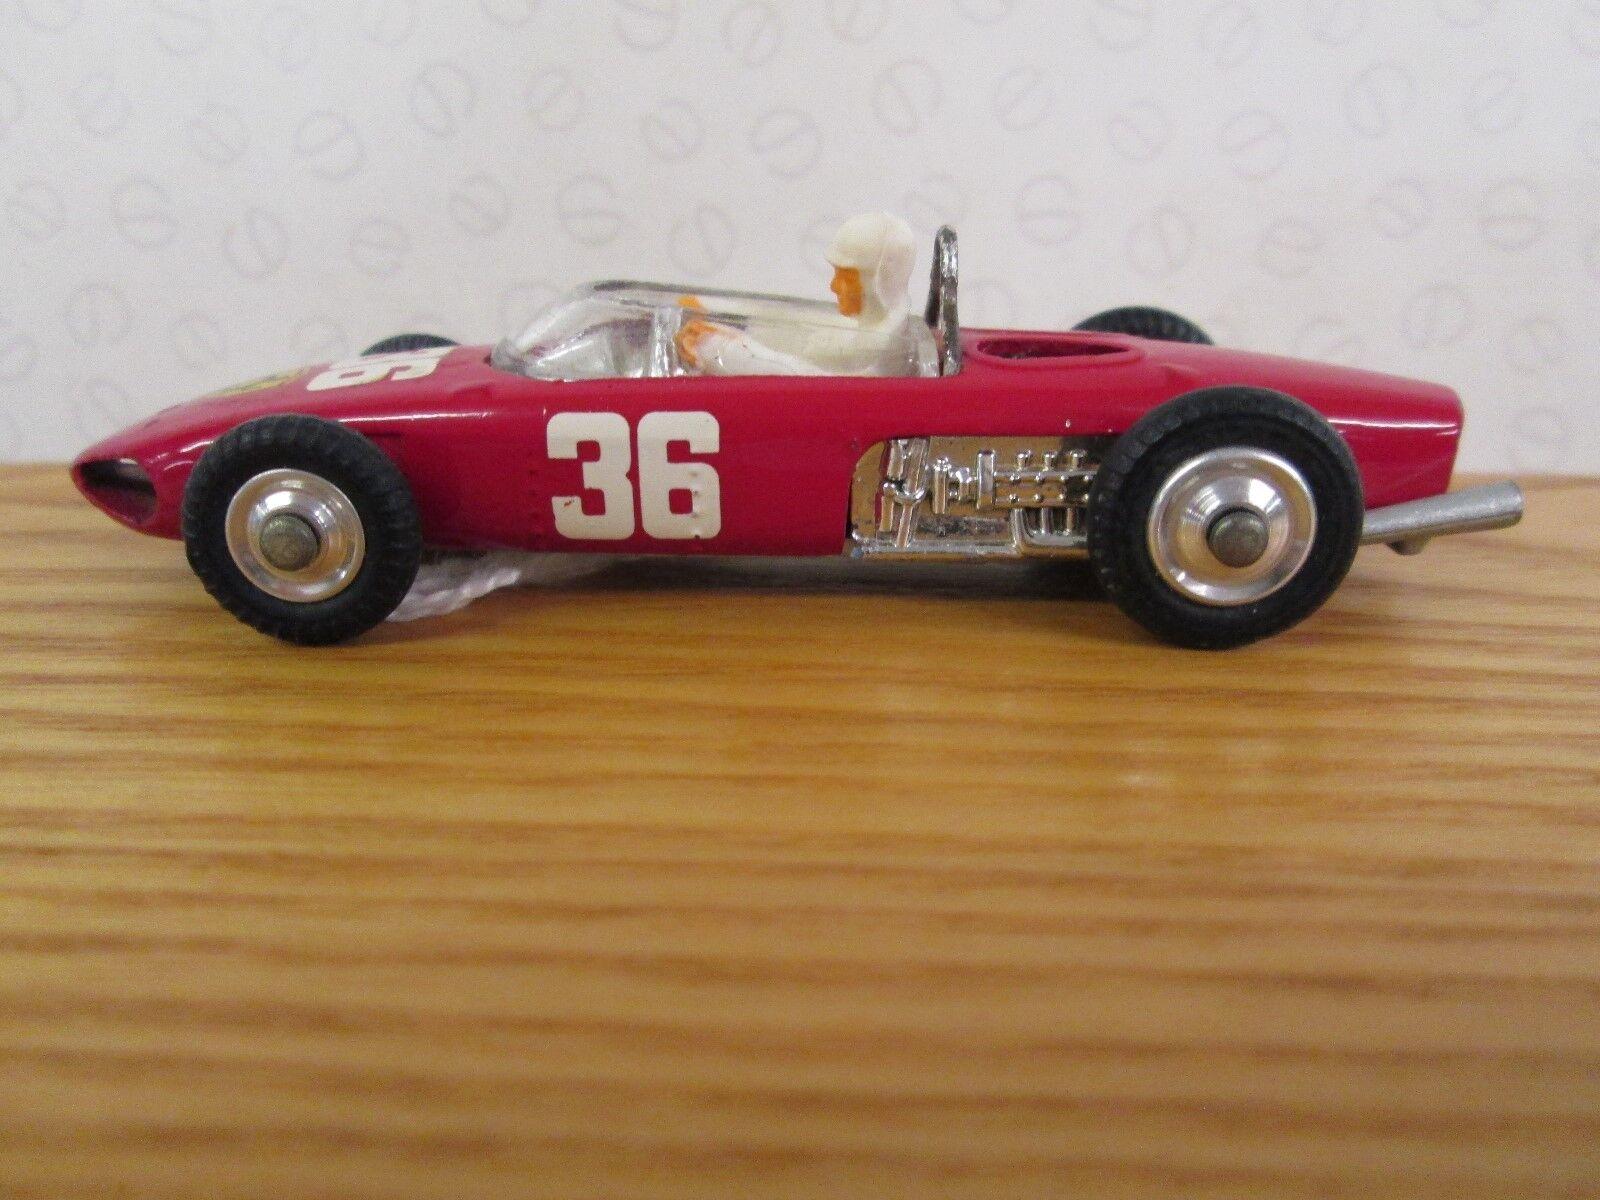 CORGI. FERRARI FORMULA 1 GP auto da corsa. 1:43. N. 36 da corsa. 154